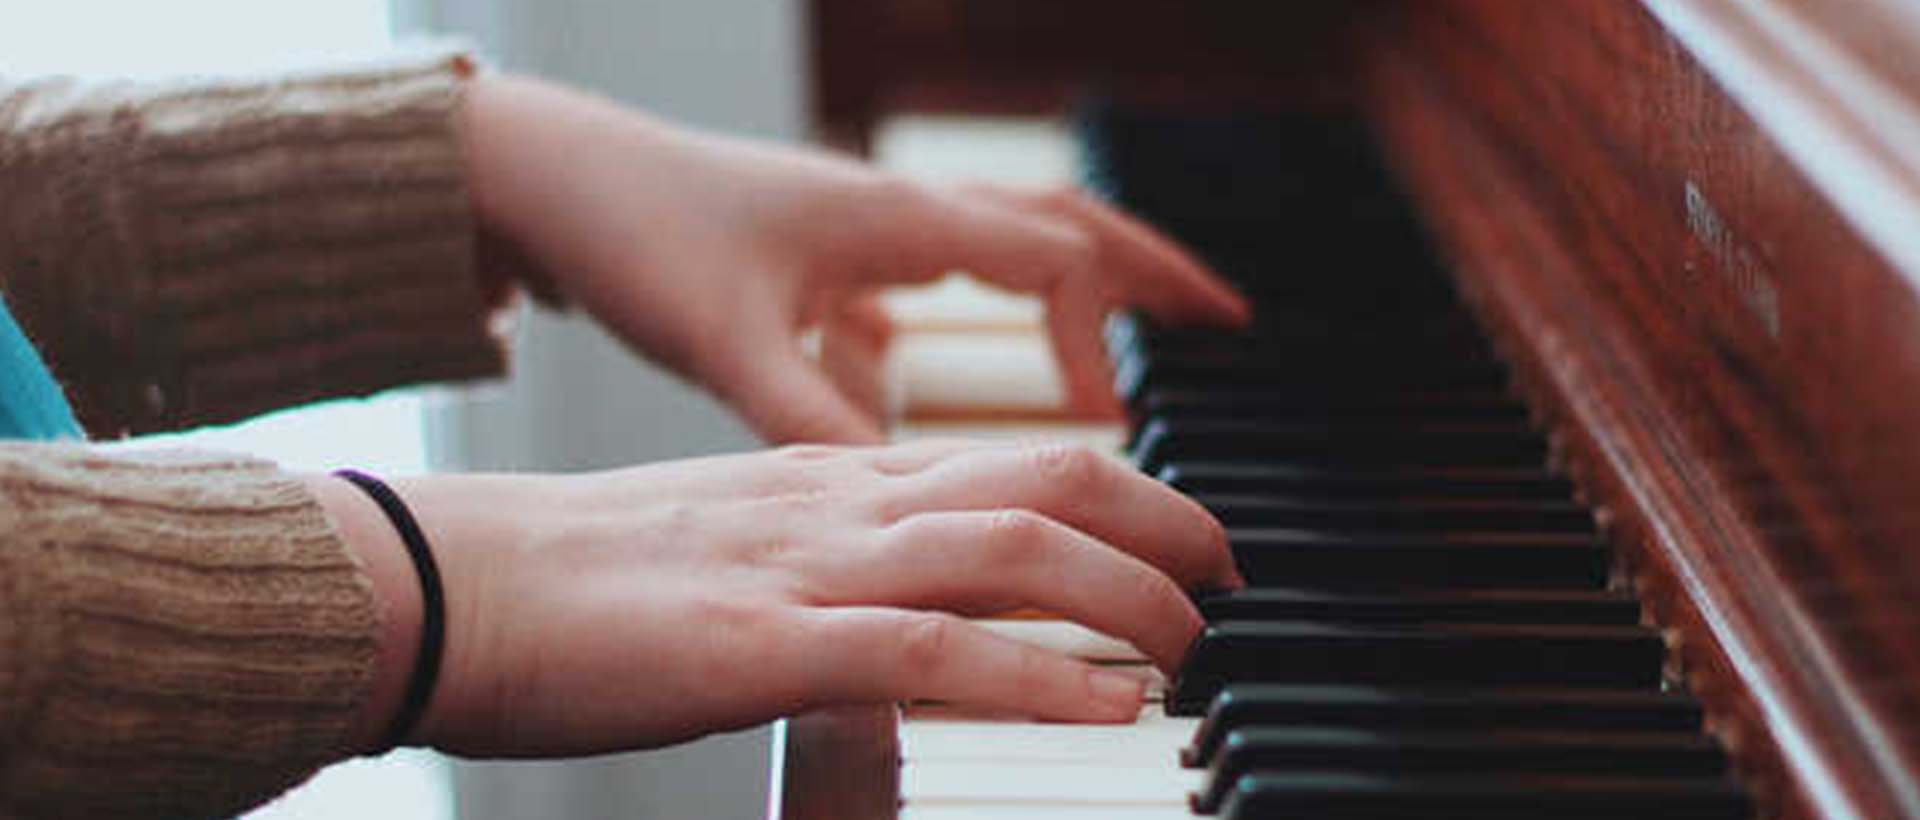 tocando piano